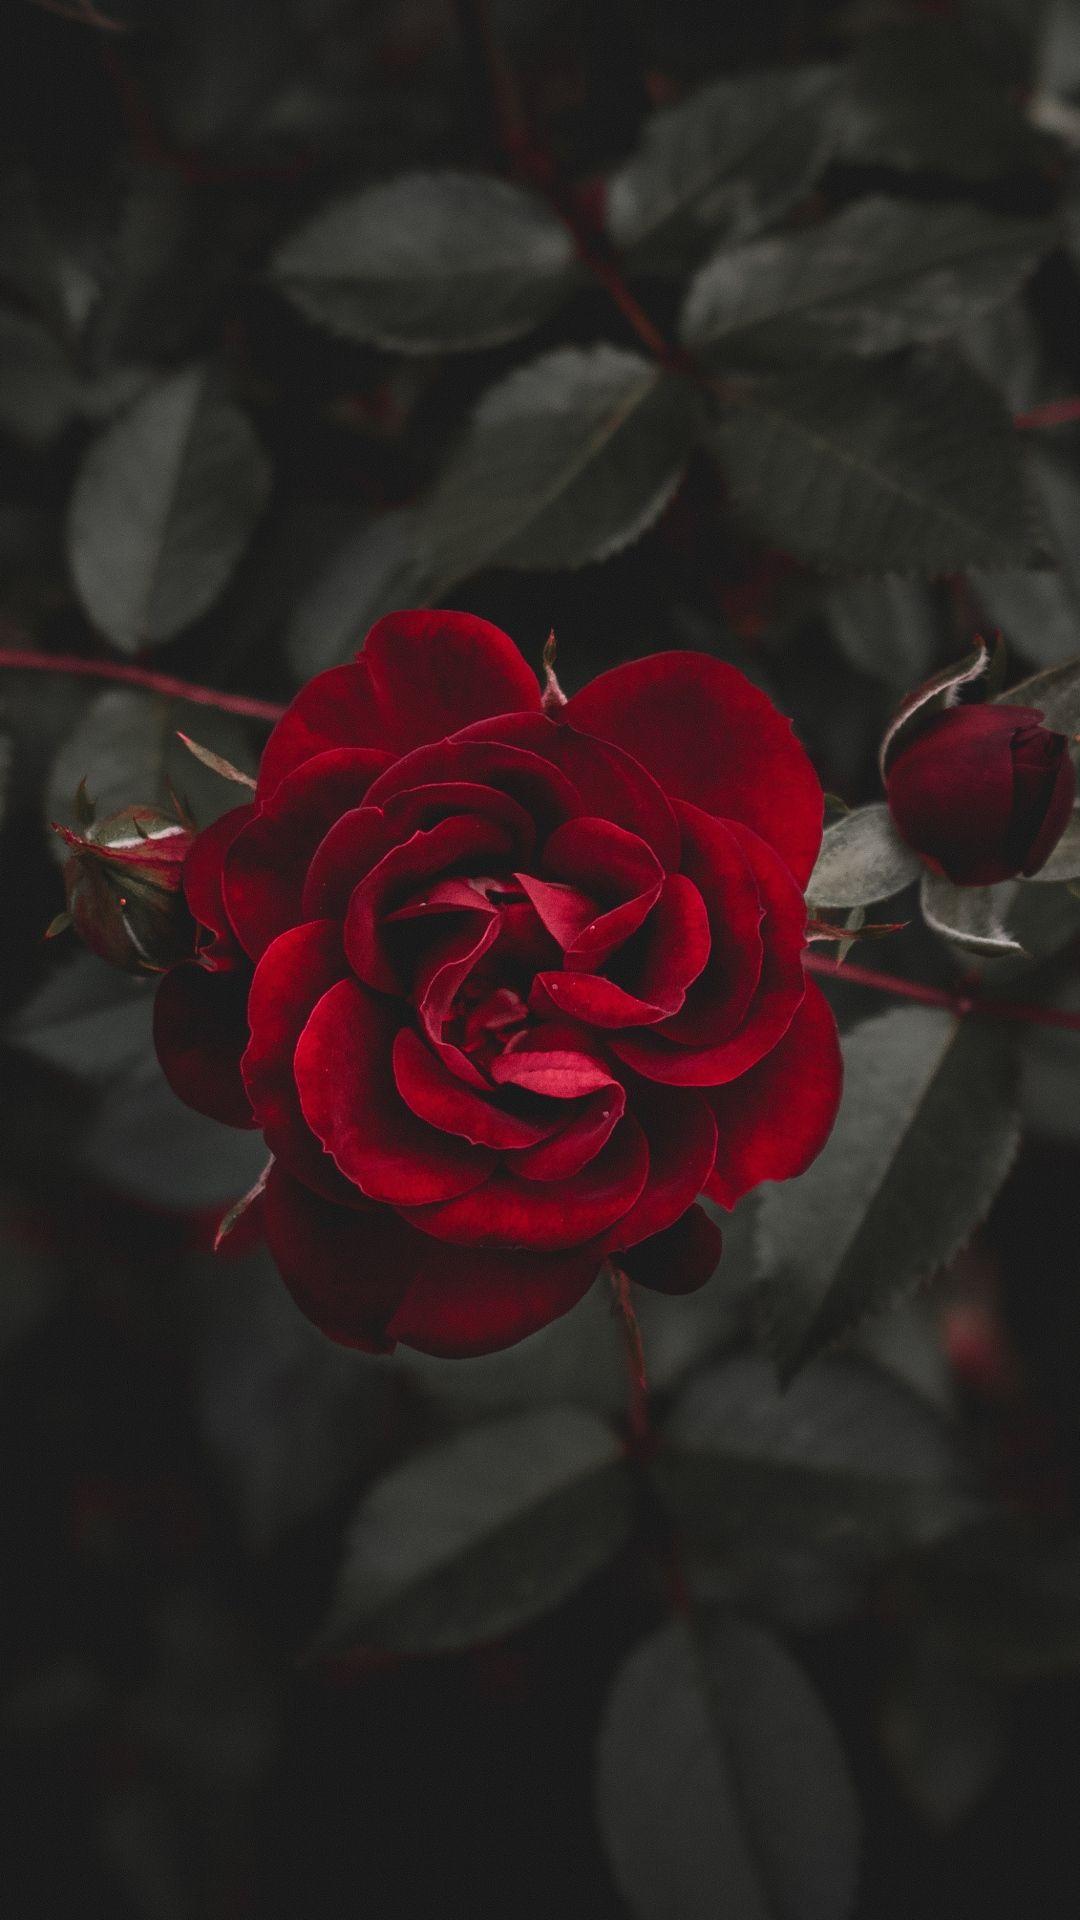 buy online 7e07e b5fe9 Rose red flower bud iPhone 8 wallpaper | Phone Backgrounds in 2019 ...